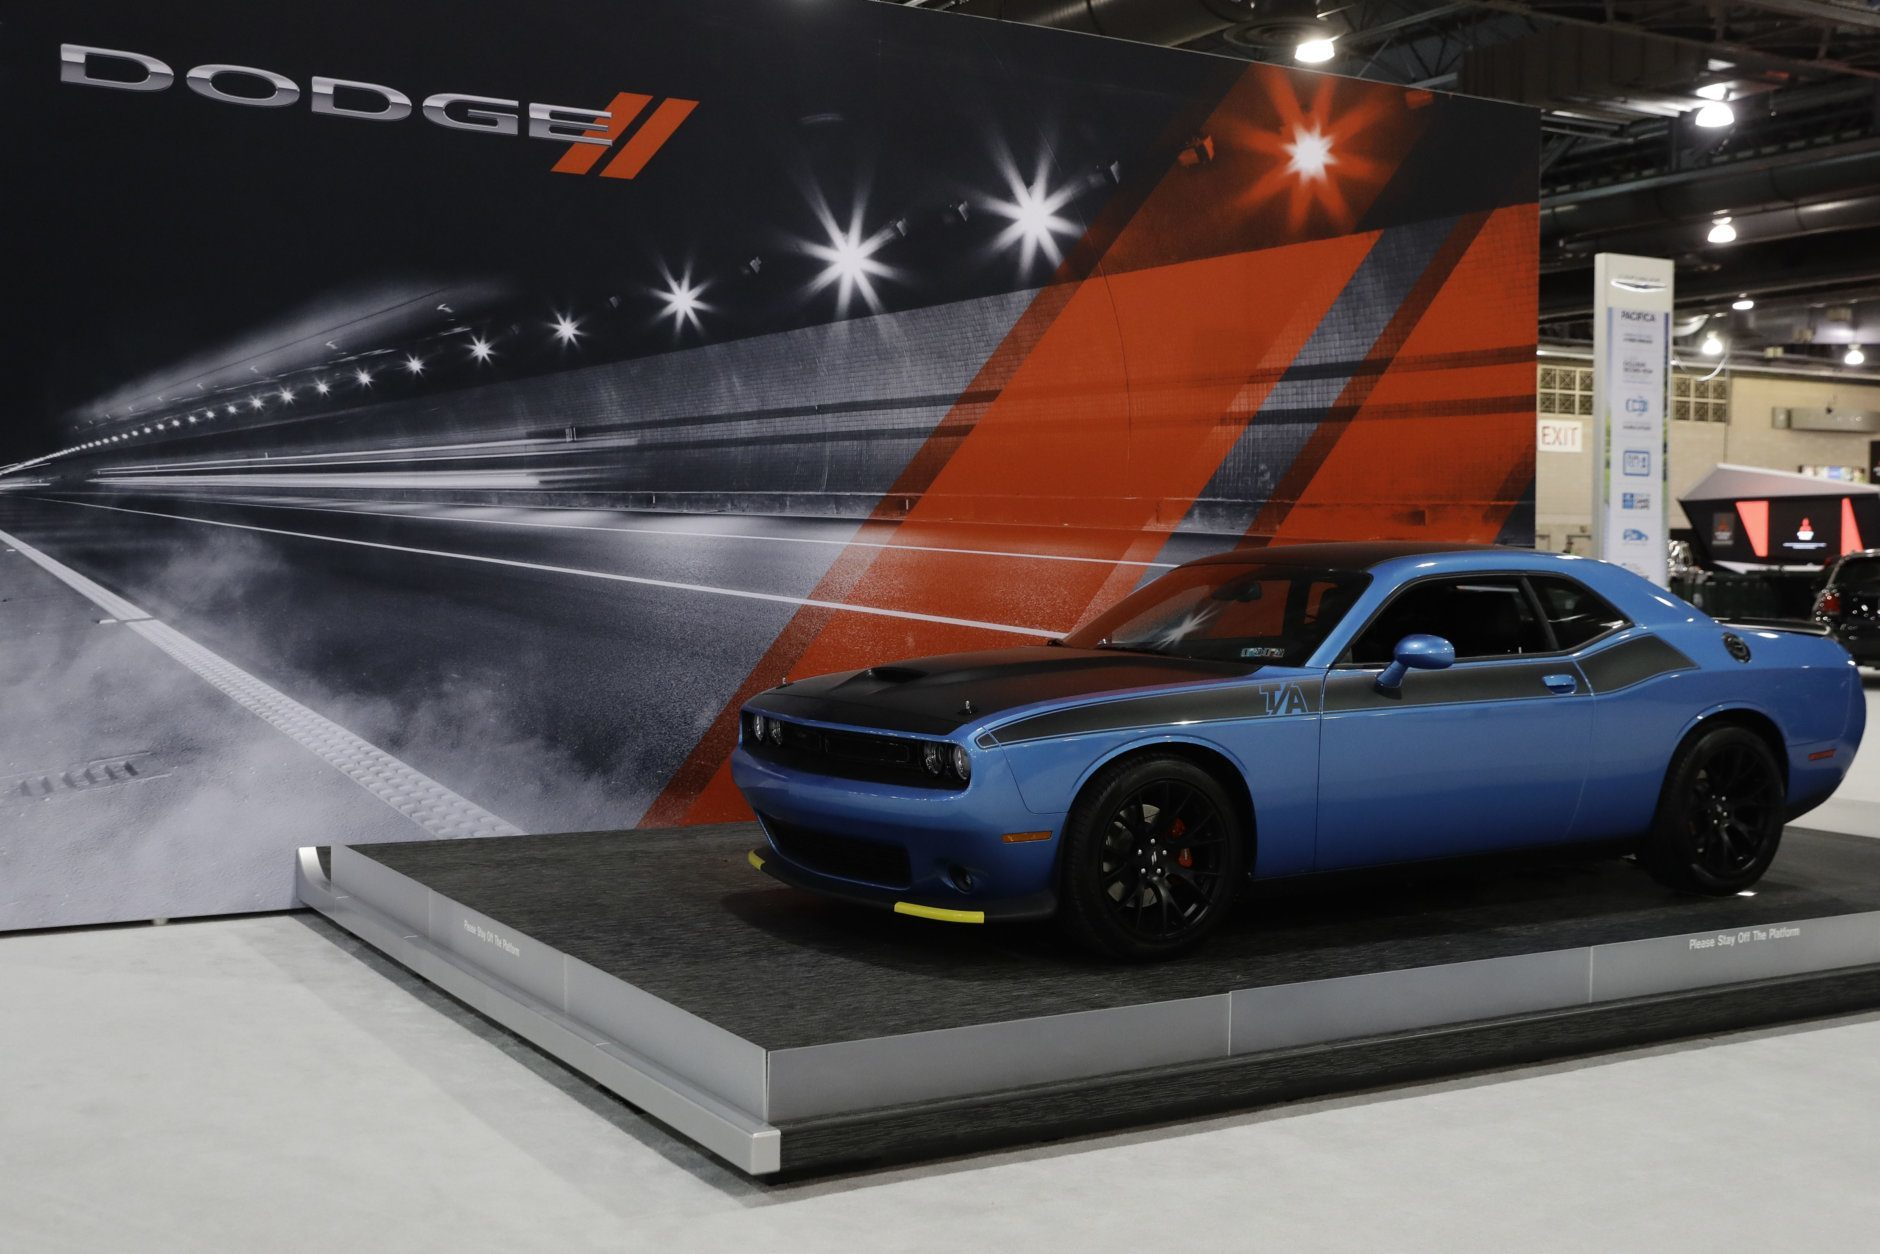 2019 Dodge Challenger: 0% financing for 36 months plus $1,250 bonus cash (AP Photo/Matt Slocum)